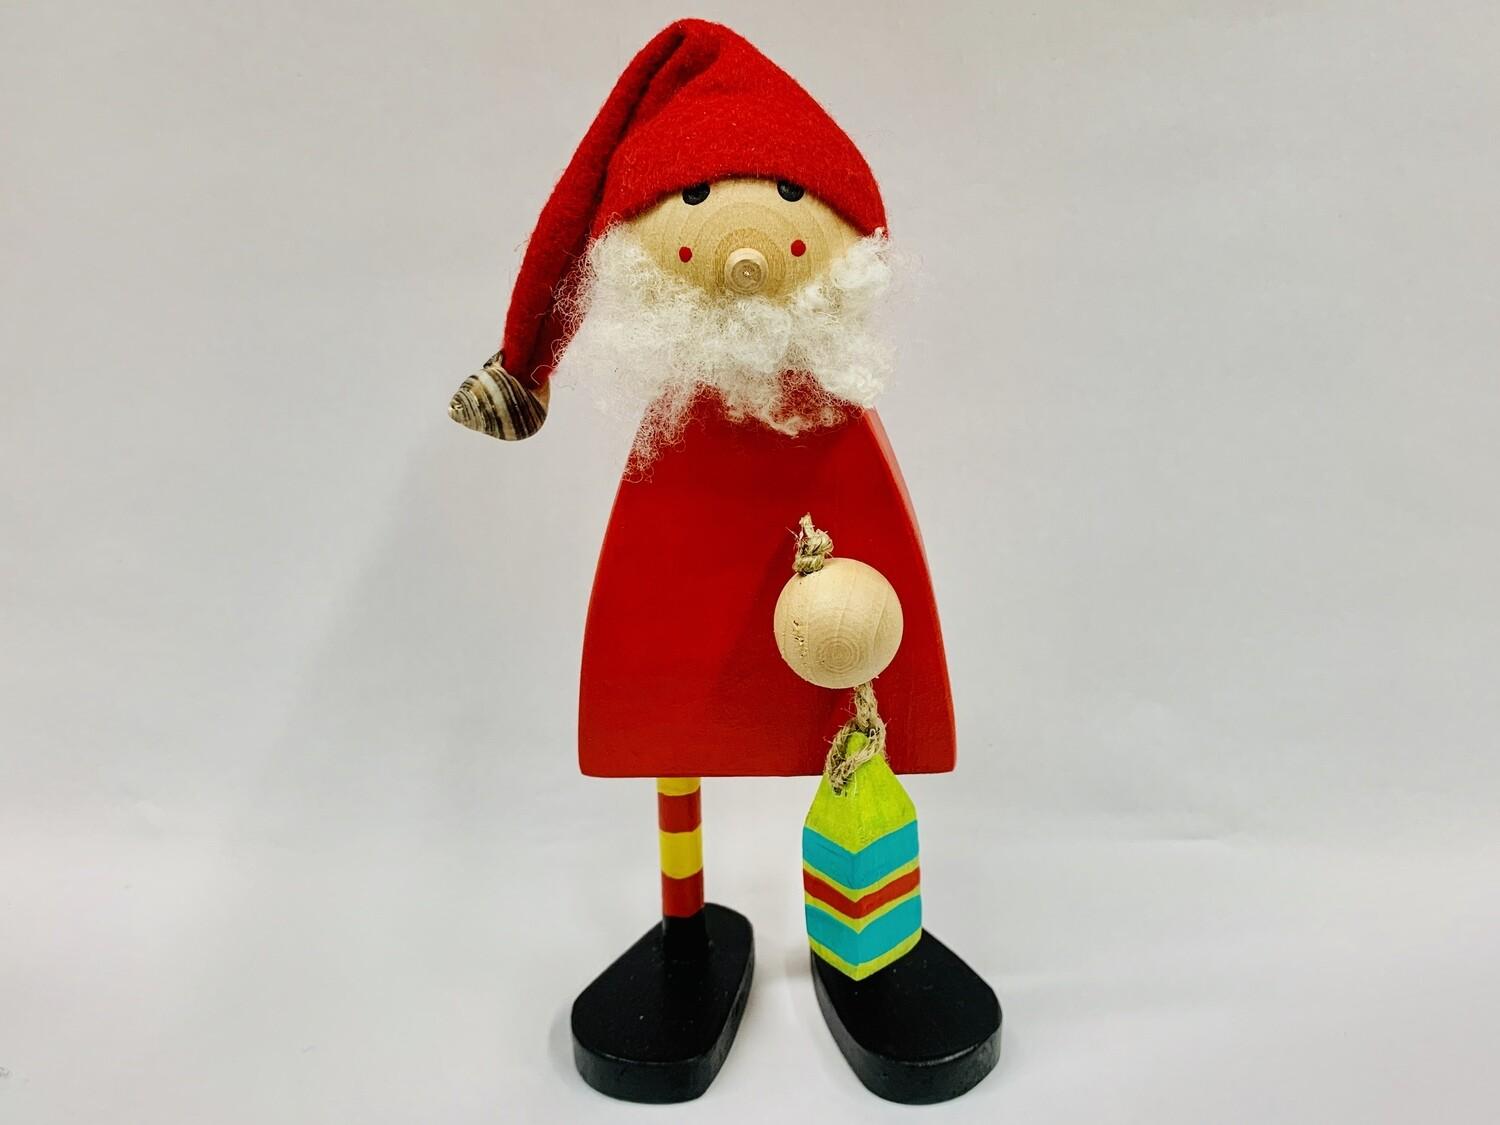 Timberdoodle Felted Hat Santa- Buoy